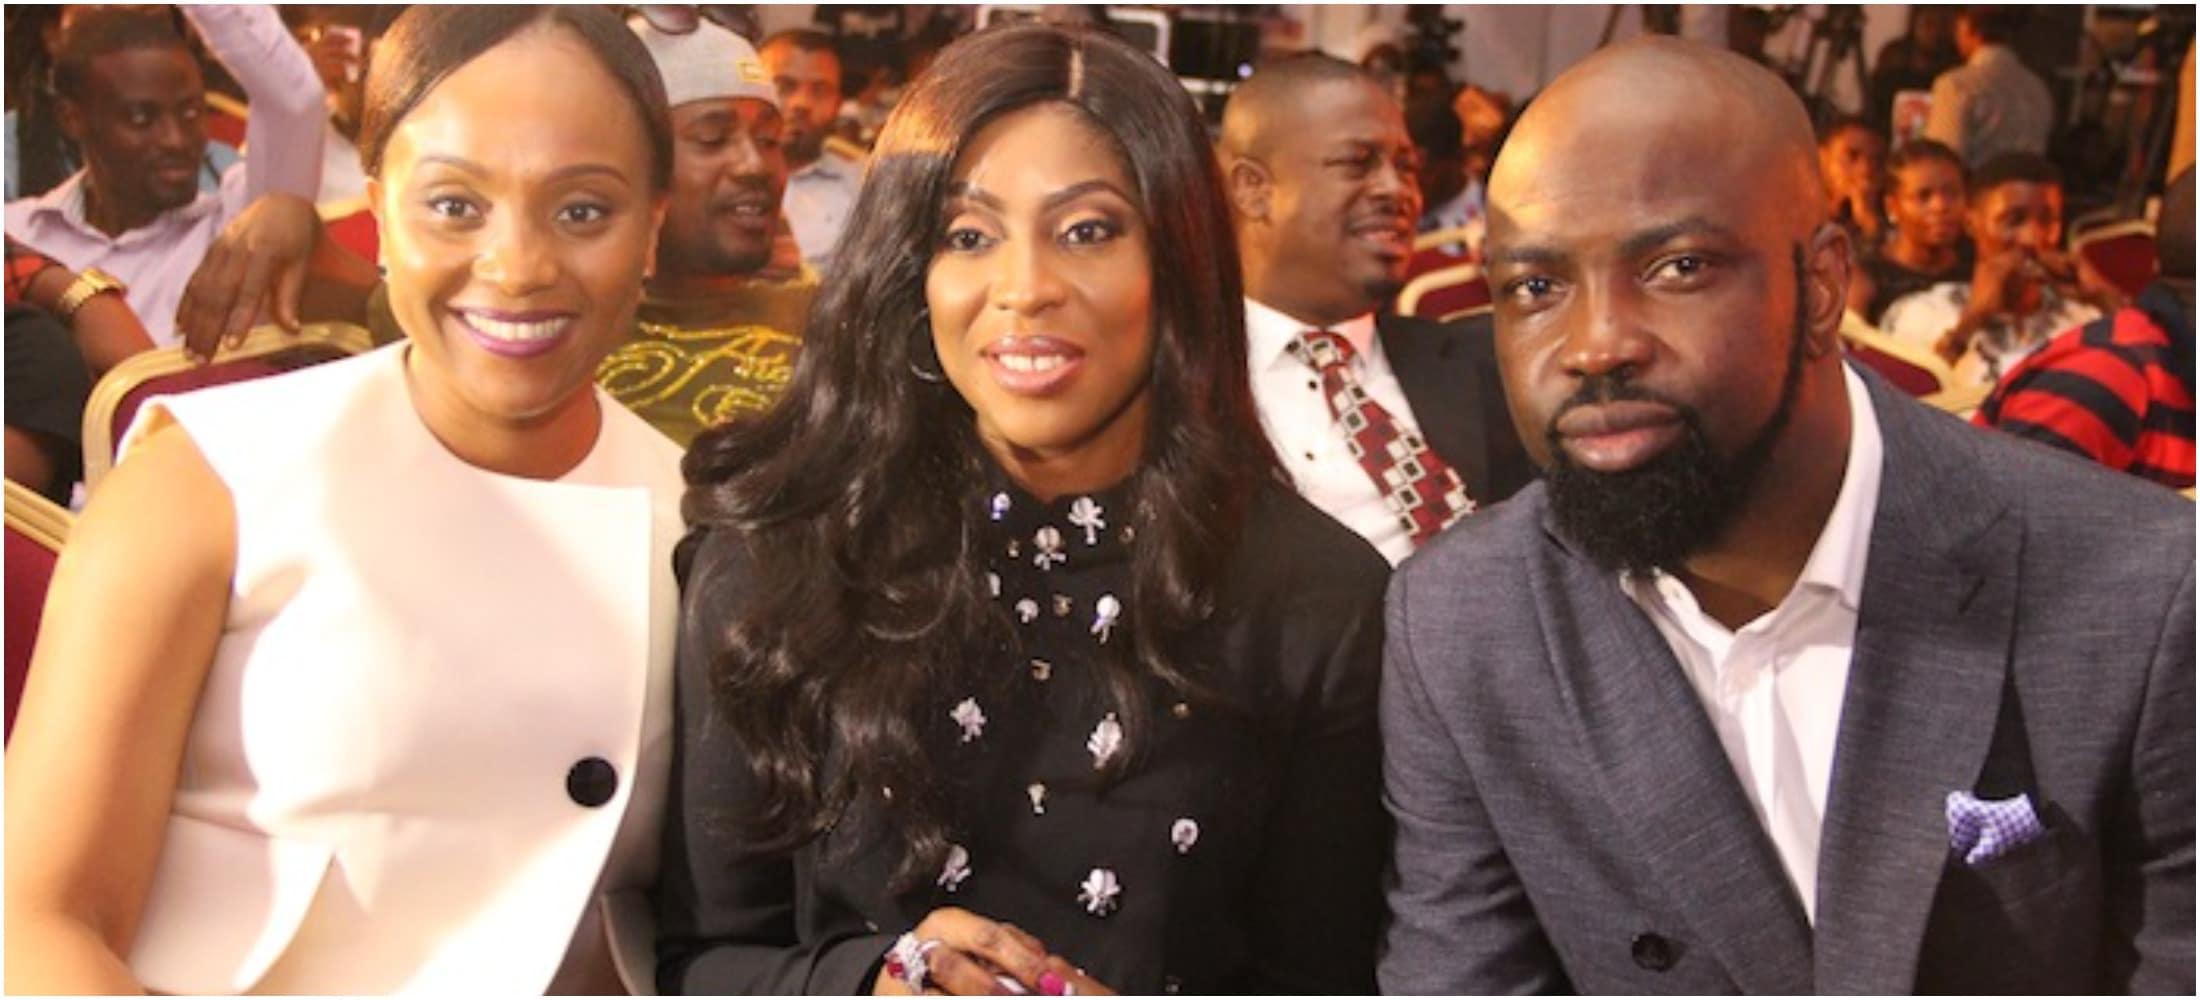 Ifeoma Williams, Mo Abudu, Audu Makoiri